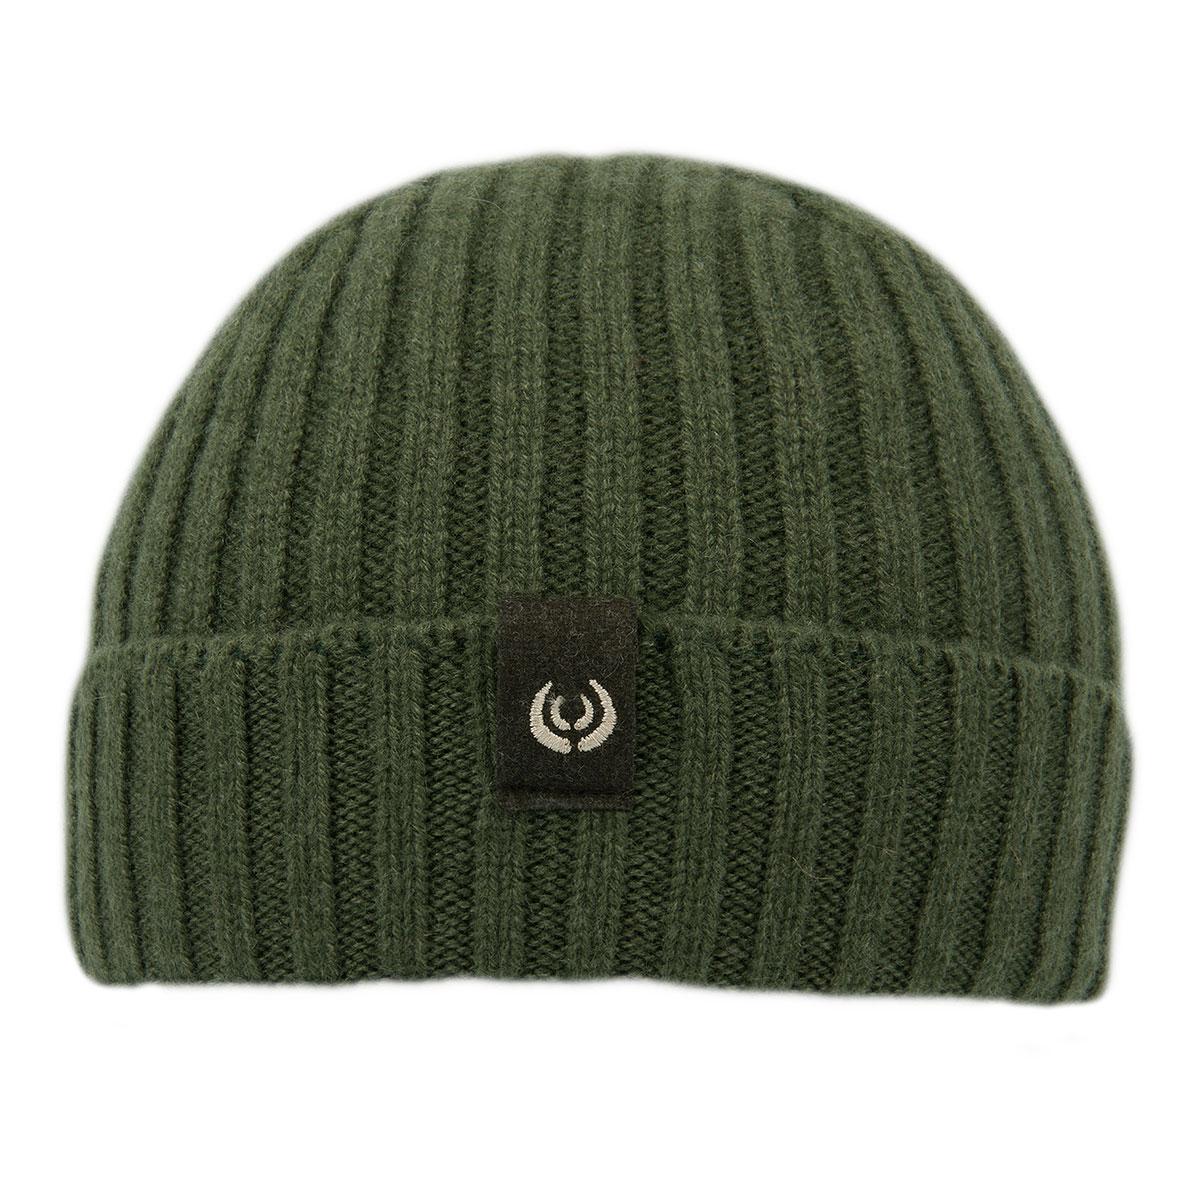 KEYLER Kaschmir Mütze Grün-Meliert im Pareyshop